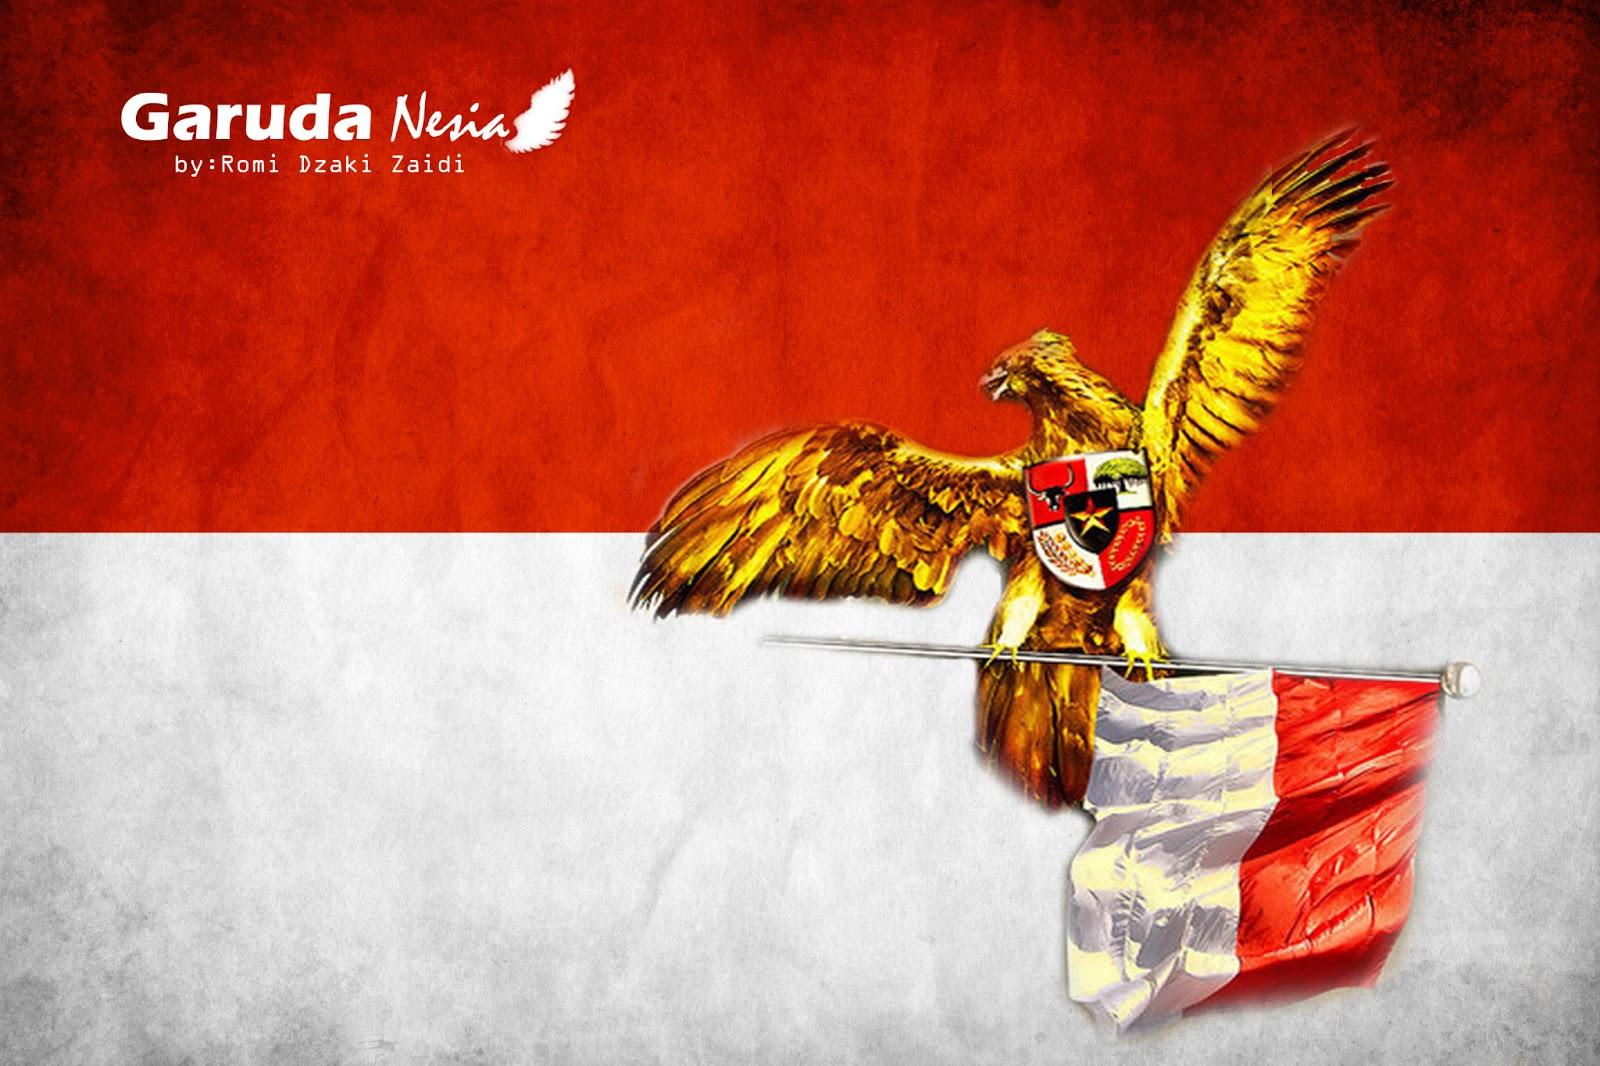 alternative course of action in garuda indonesia